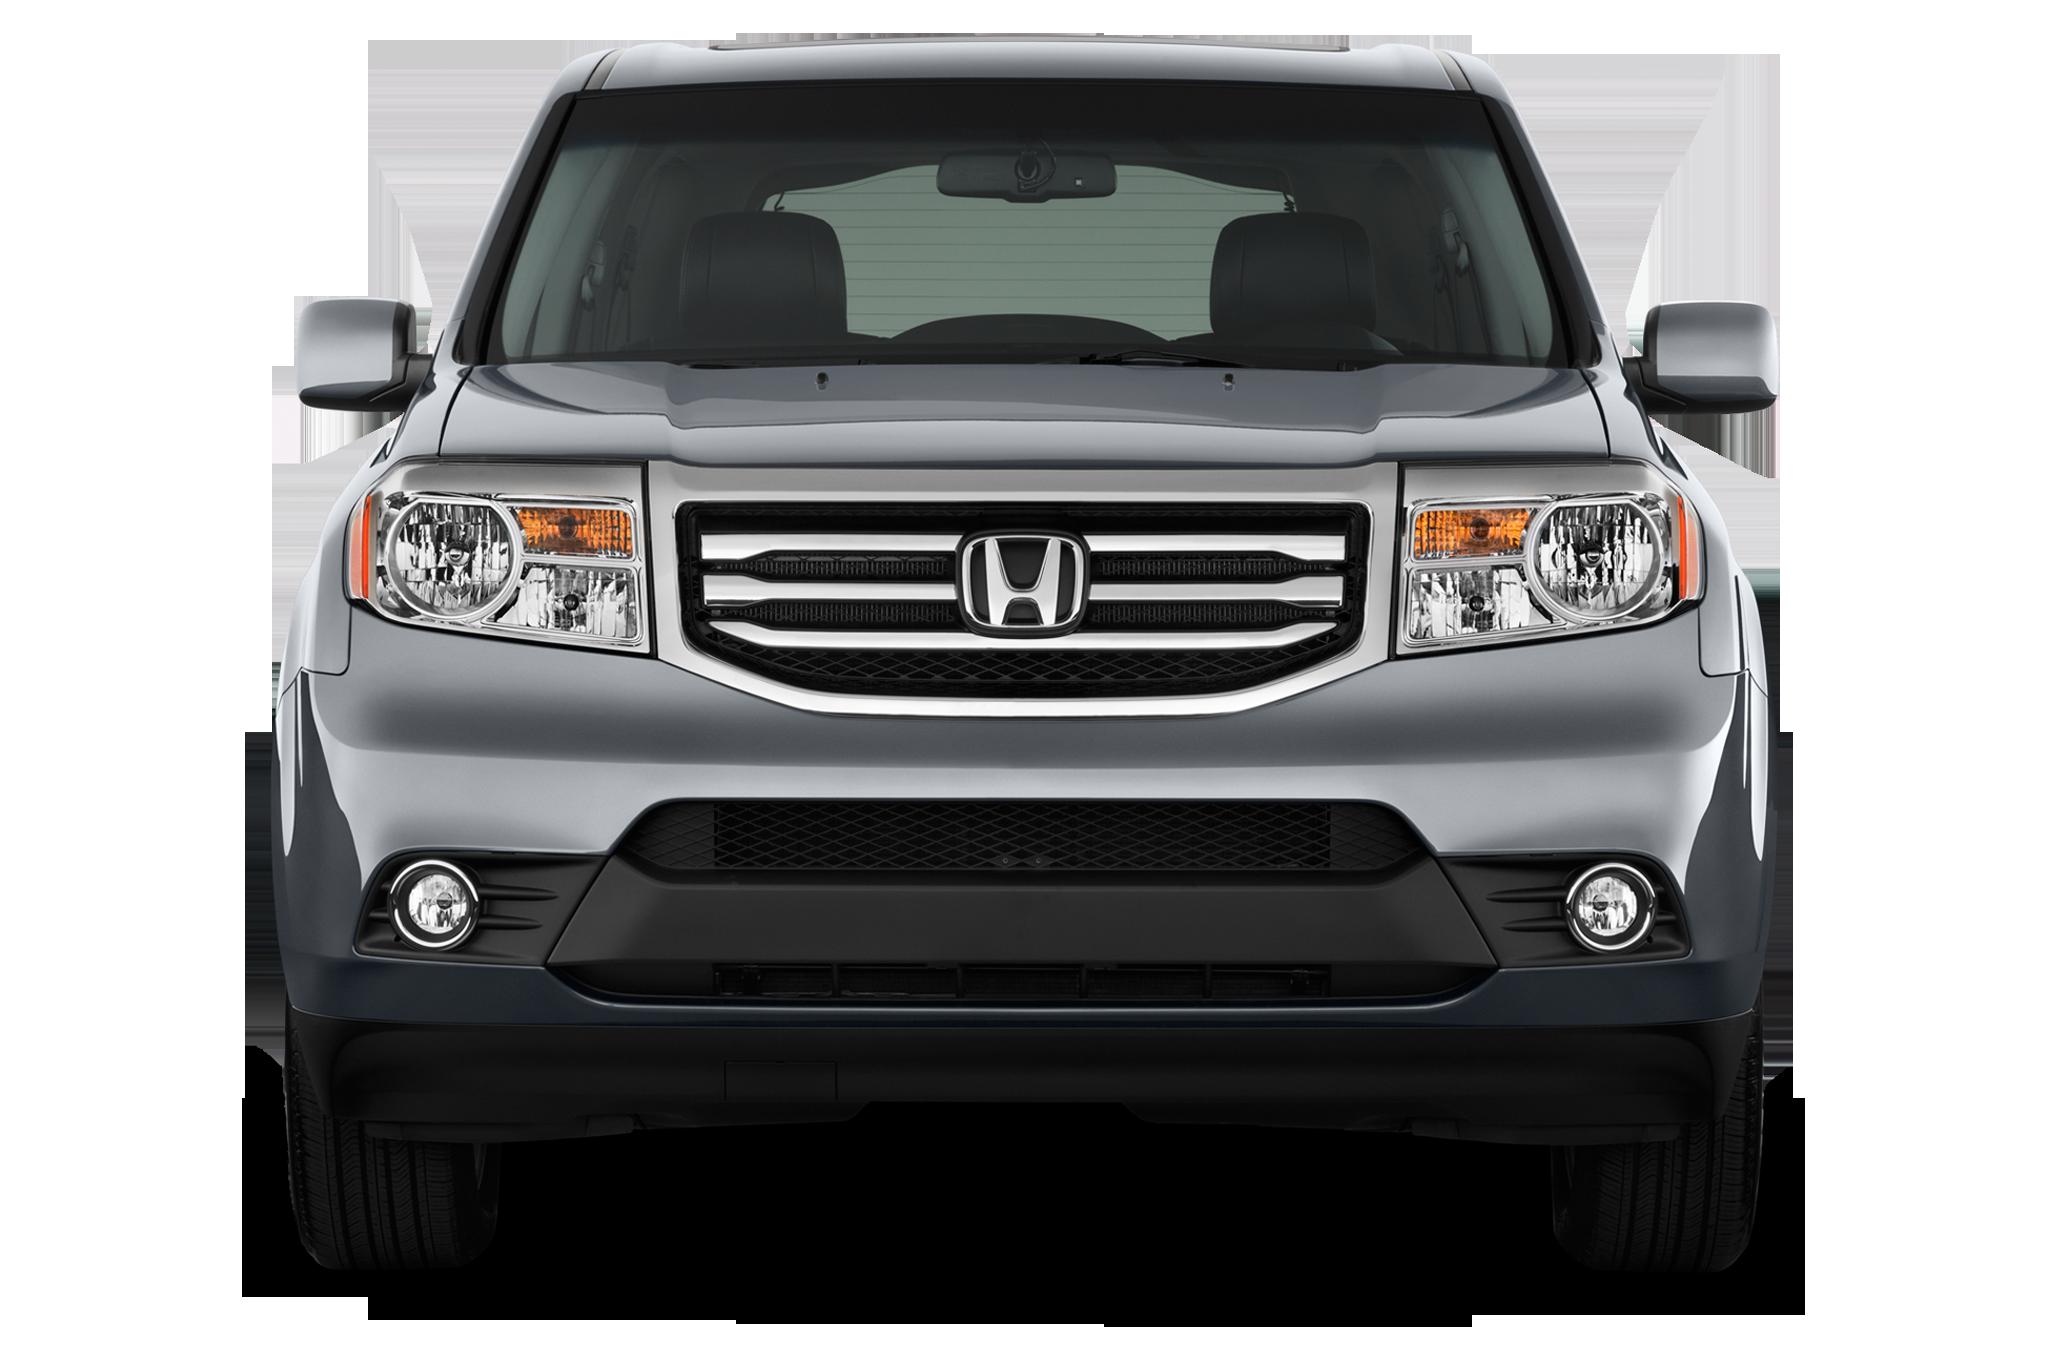 2012 Honda Pilot 4WD Touring - Editors' Notebook ...